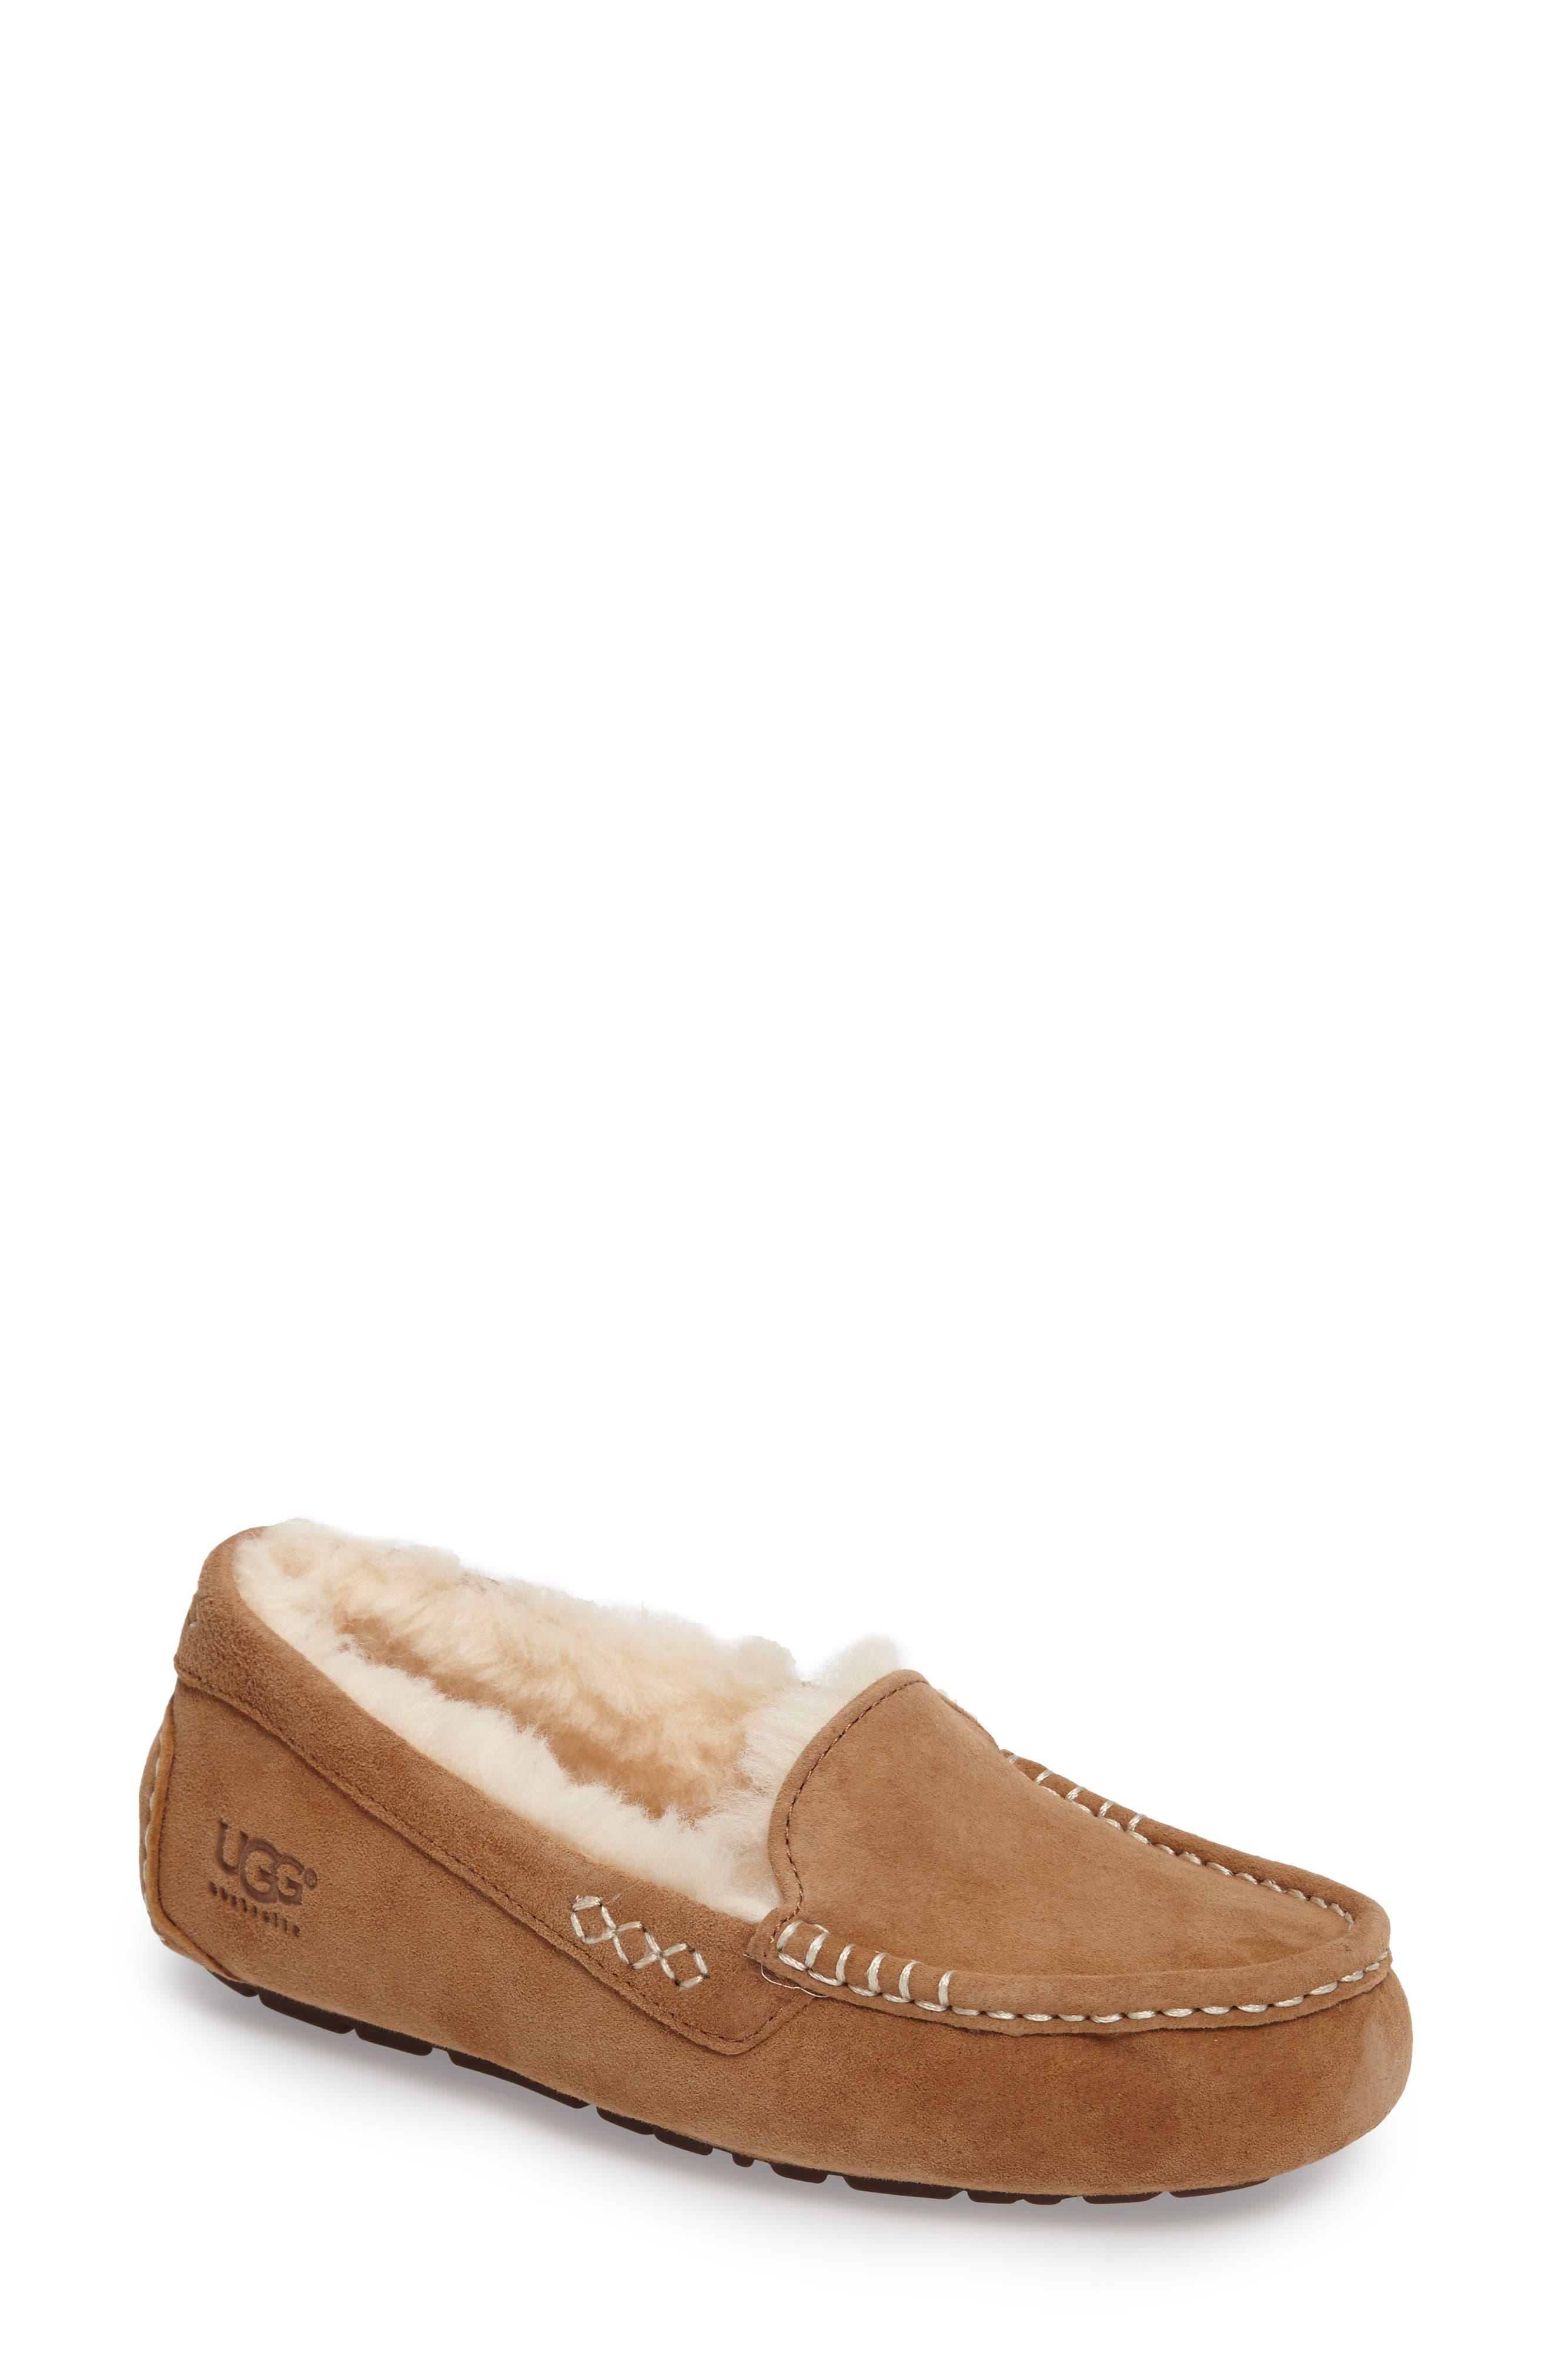 Ugg Ansley Water Resistant Slipper, Brown